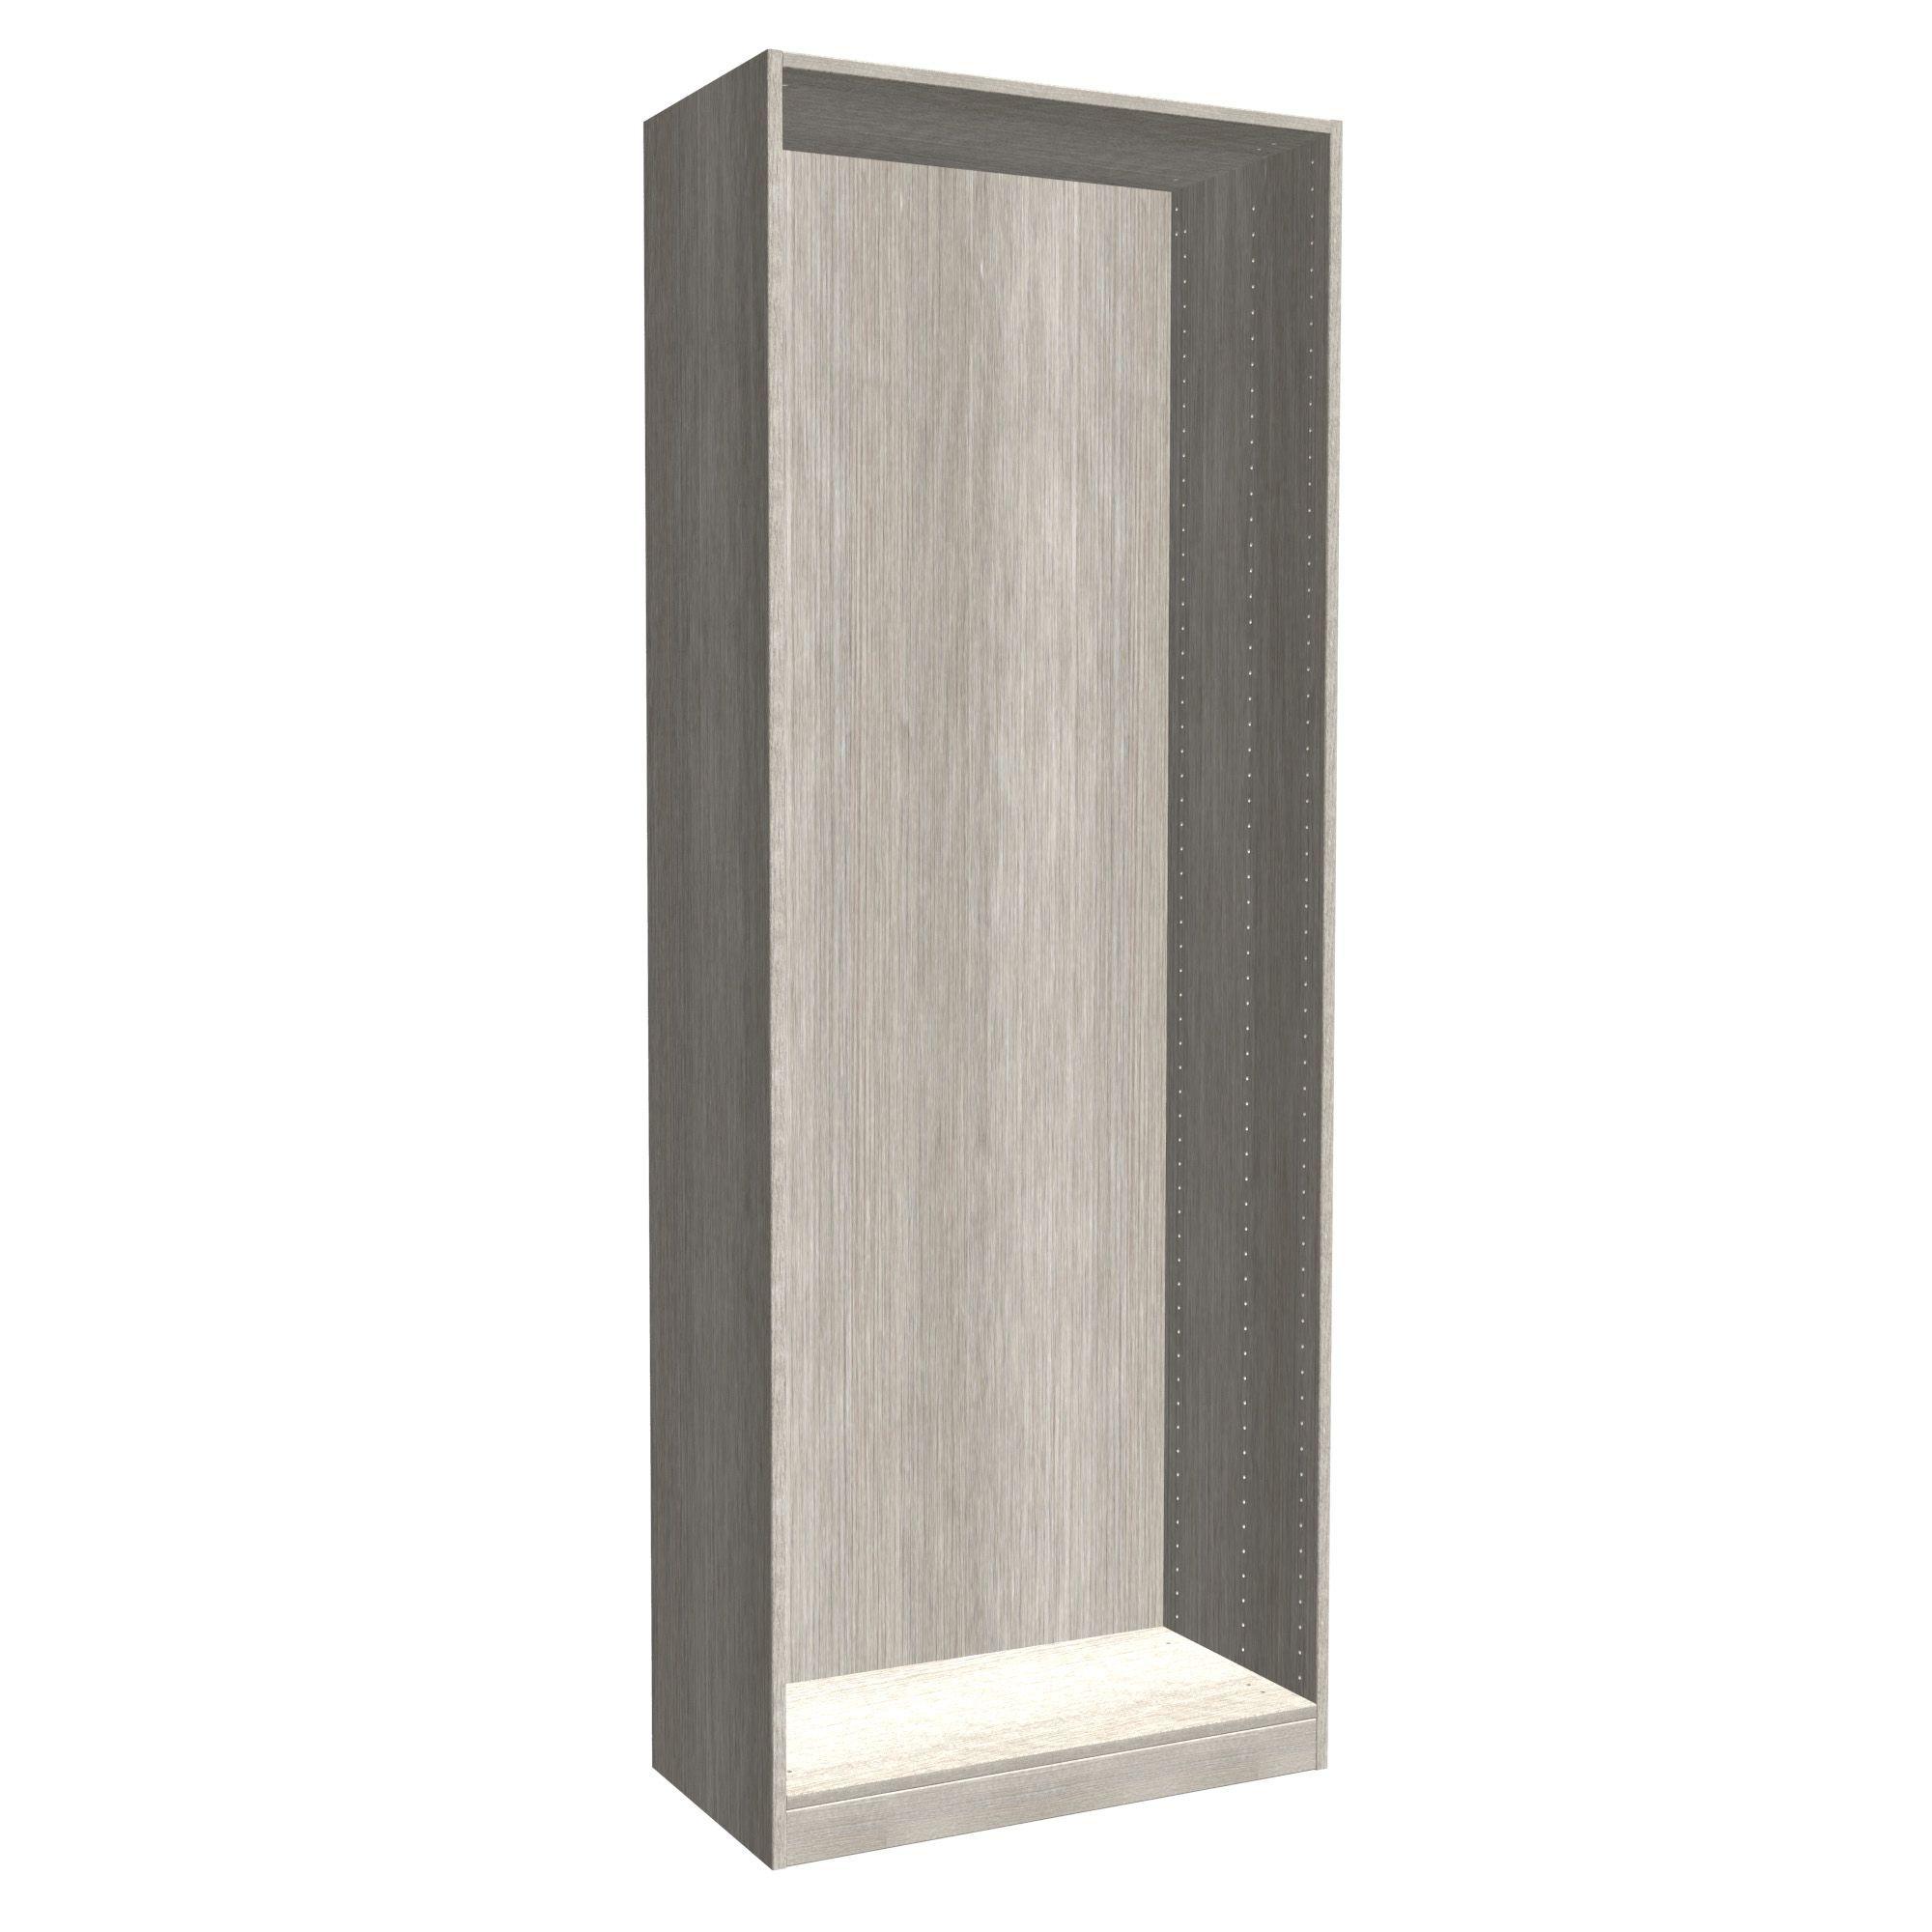 Darwin Modular Grey Oak Effect Tall Wardrobe Cabinet (h)2356mm (w)750mm (d)374mm